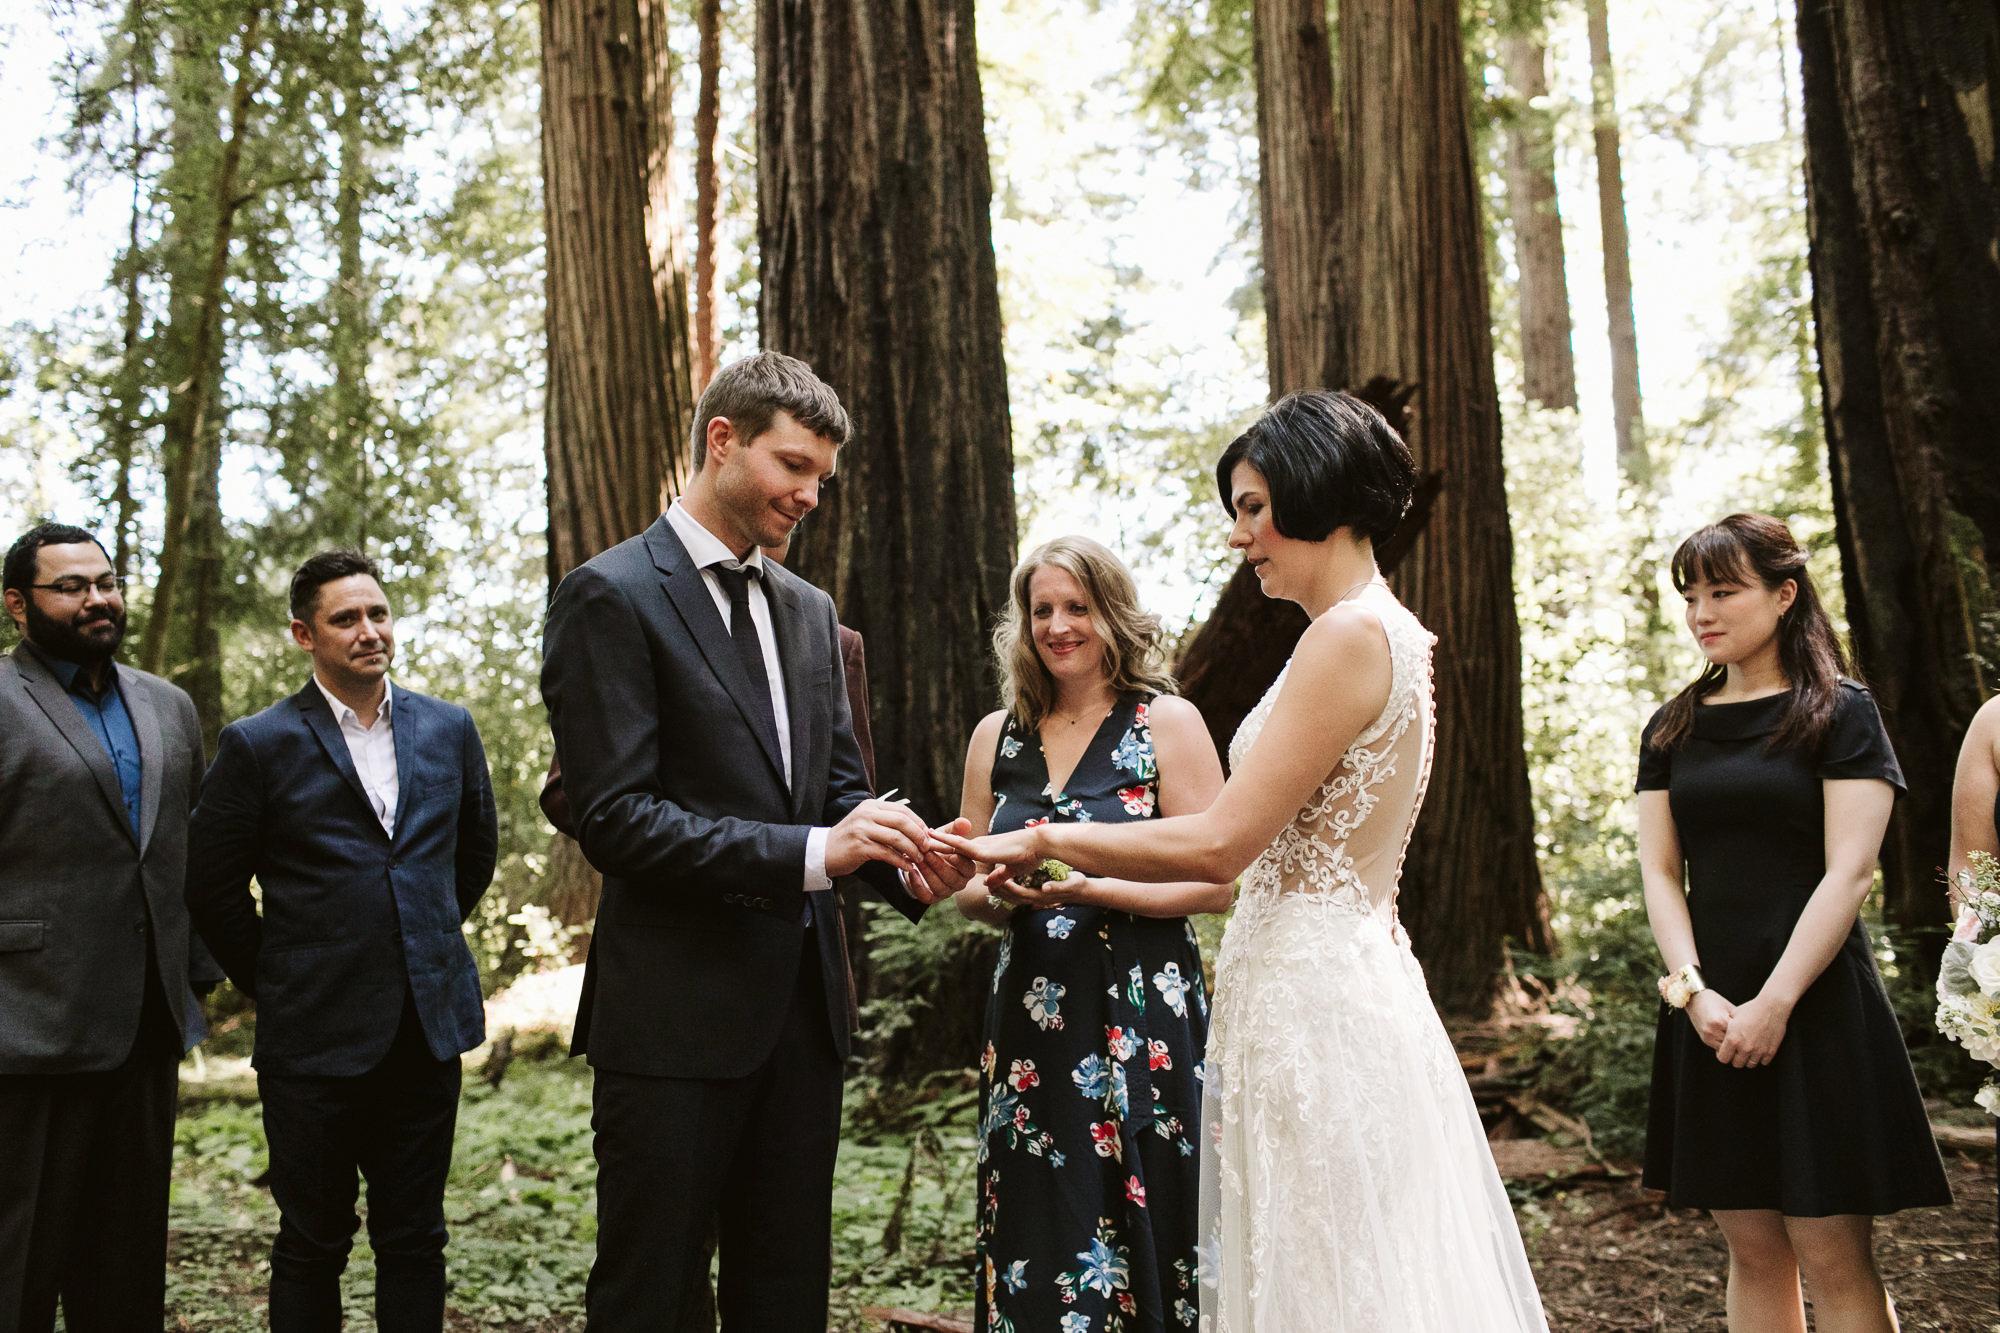 California-wedding-photographer-alfonso-flores-pamplin-groove-205.jpg